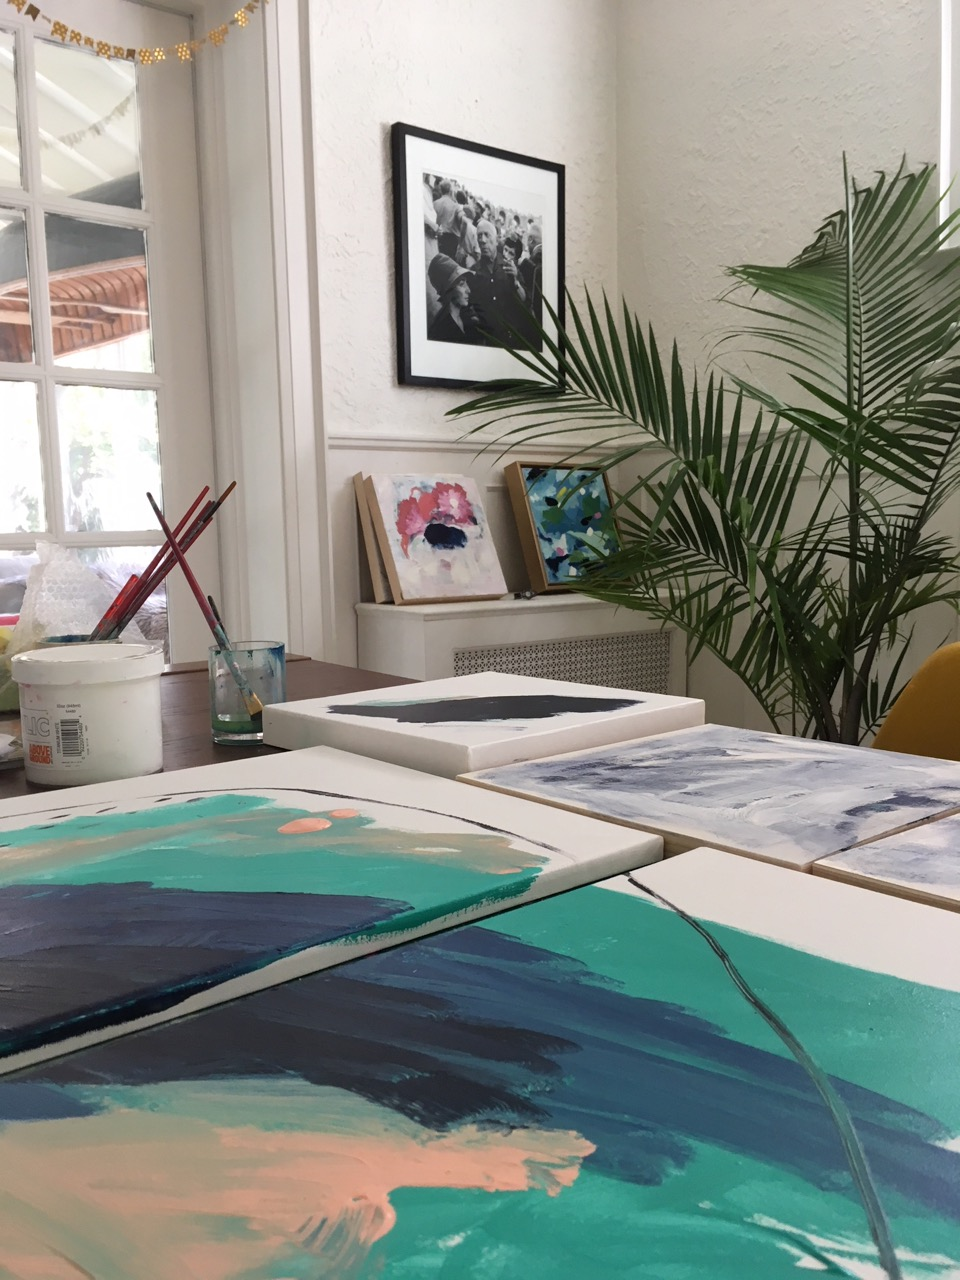 Studio views with work in progress (Companions)